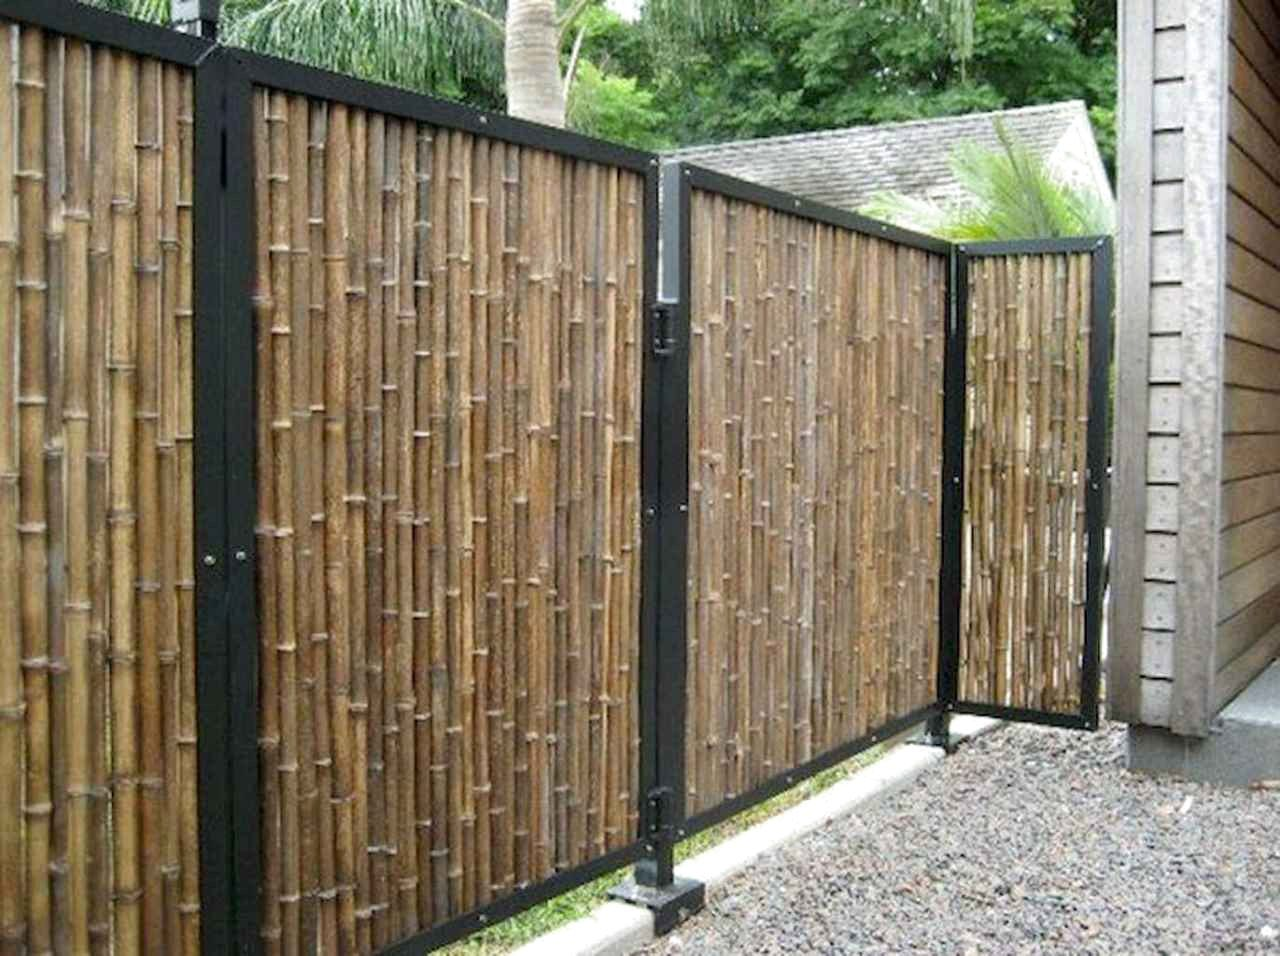 56 Best Backyard Privacy Fence Decoration Ideas On A Budget